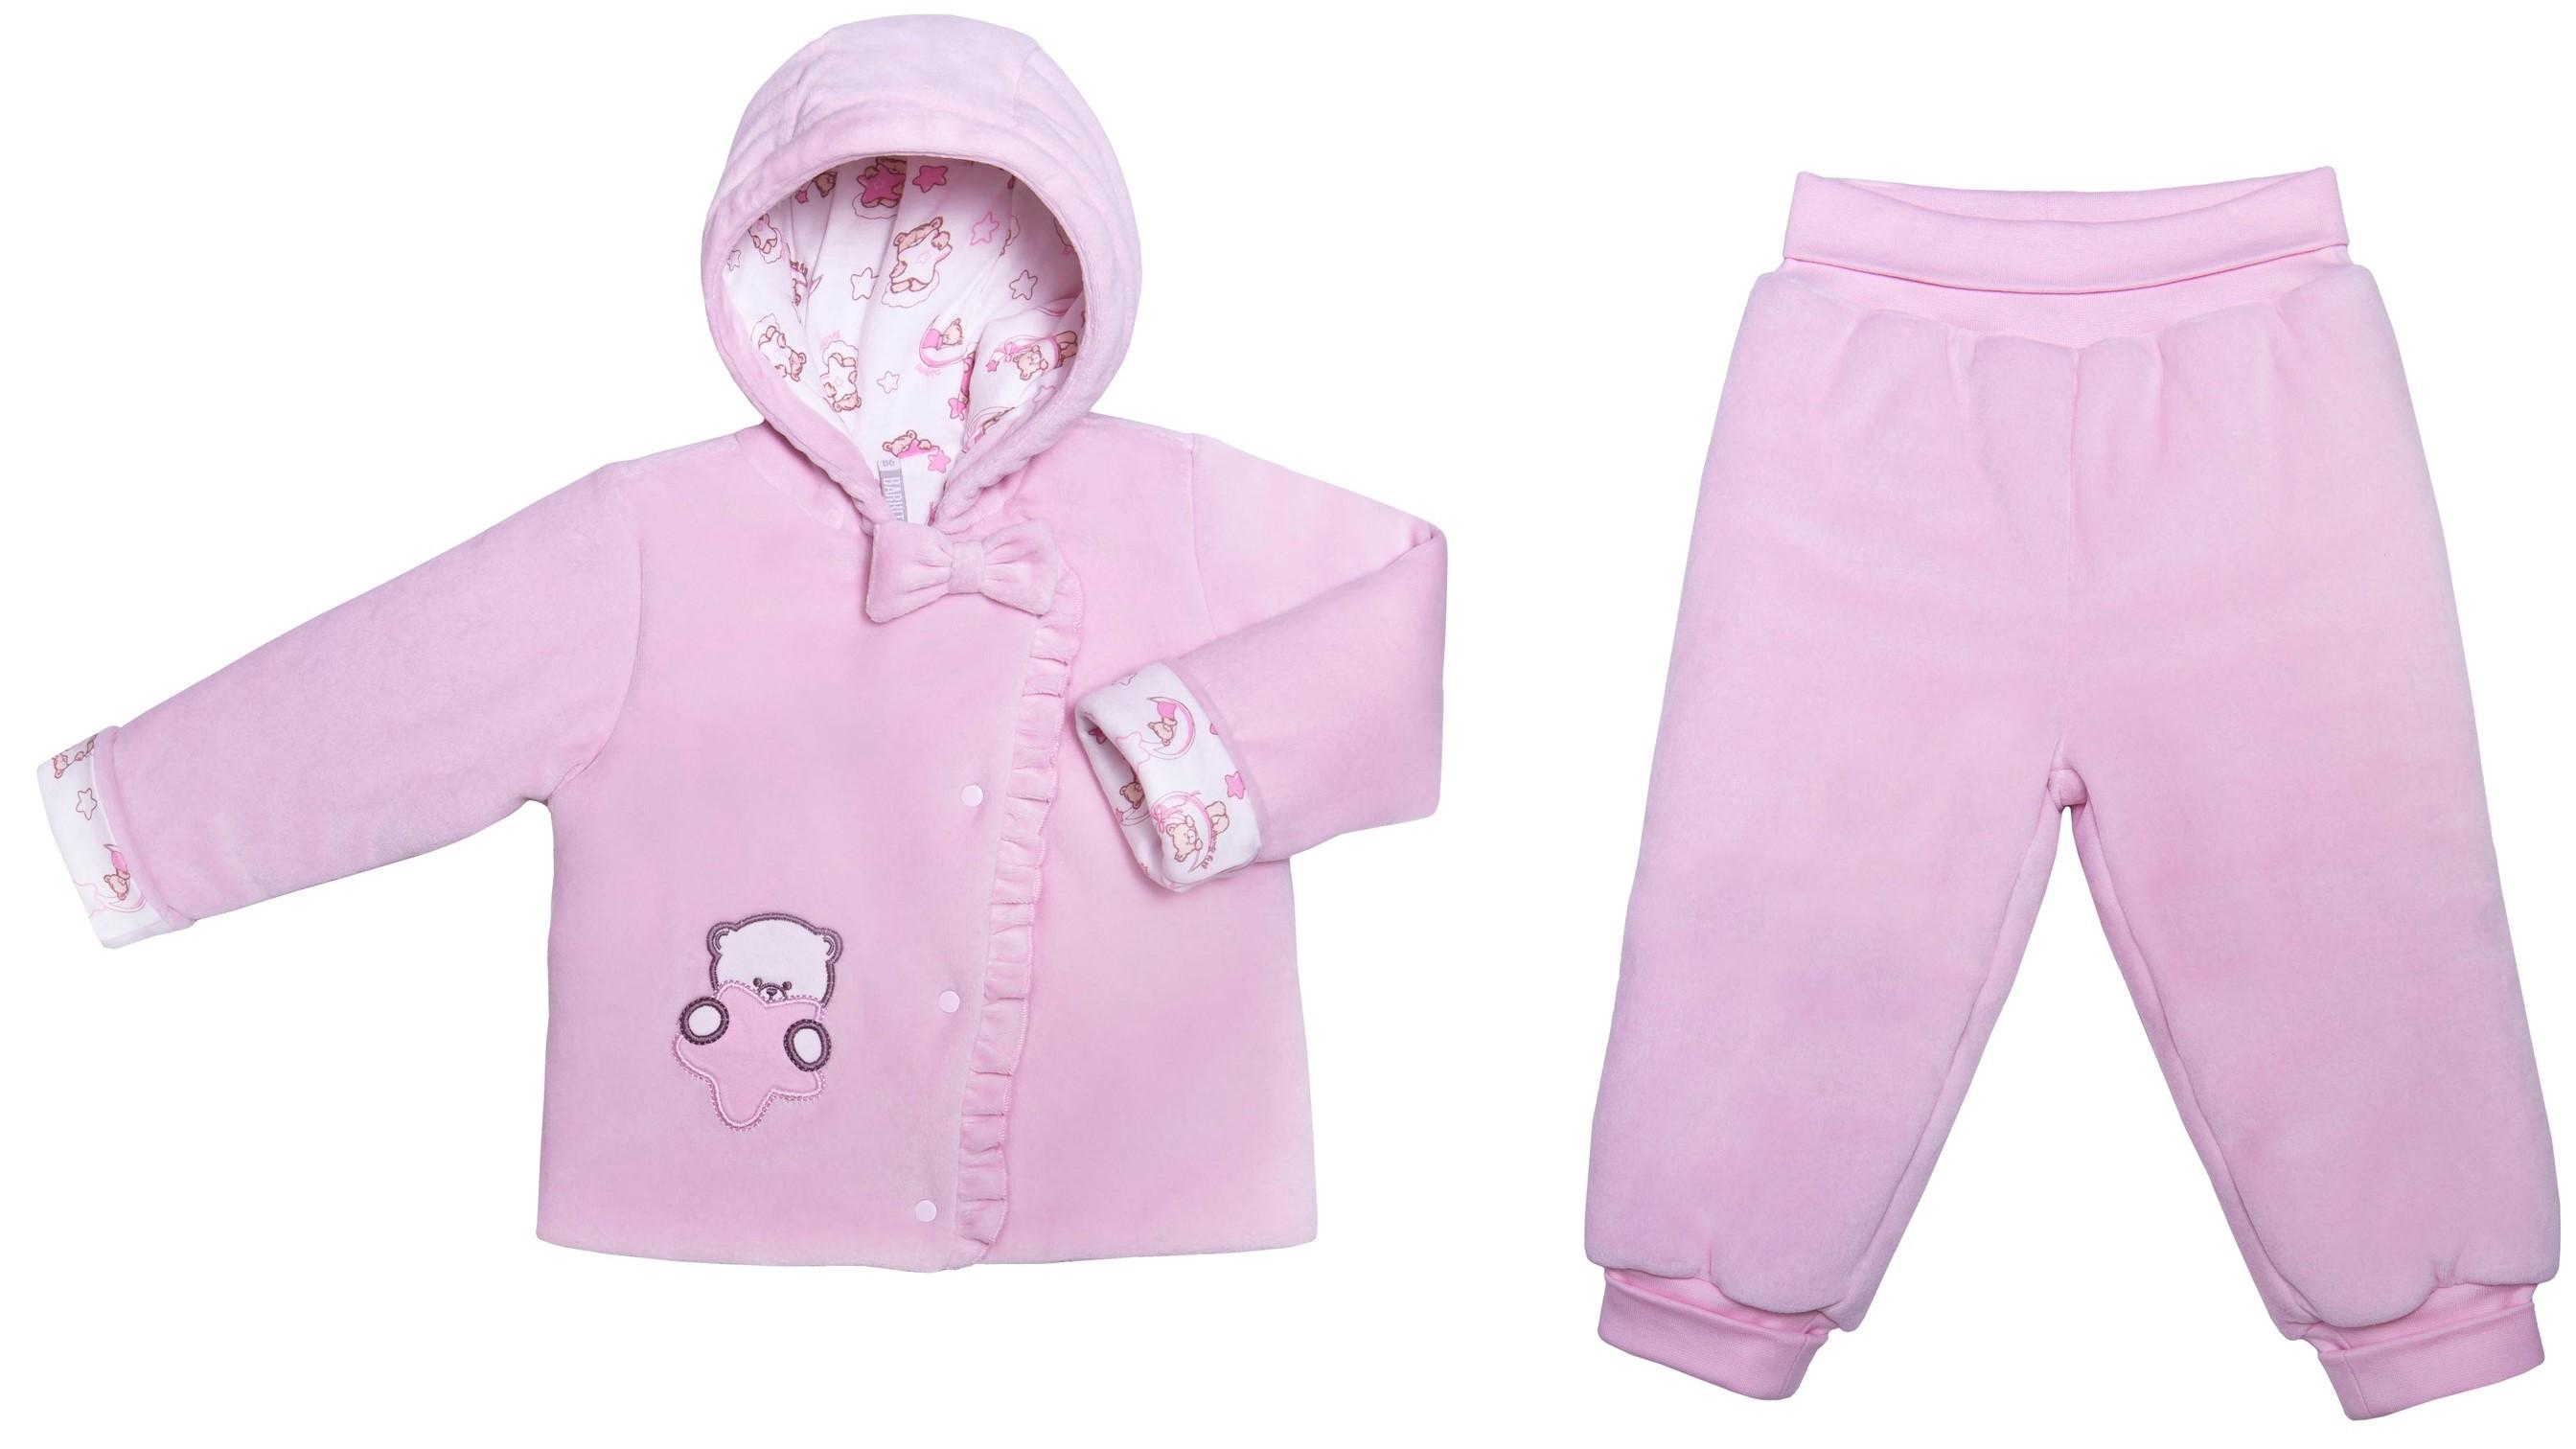 Жакет и штаны для мальчика Barkito Сладкие сны толстовки barkito галактика